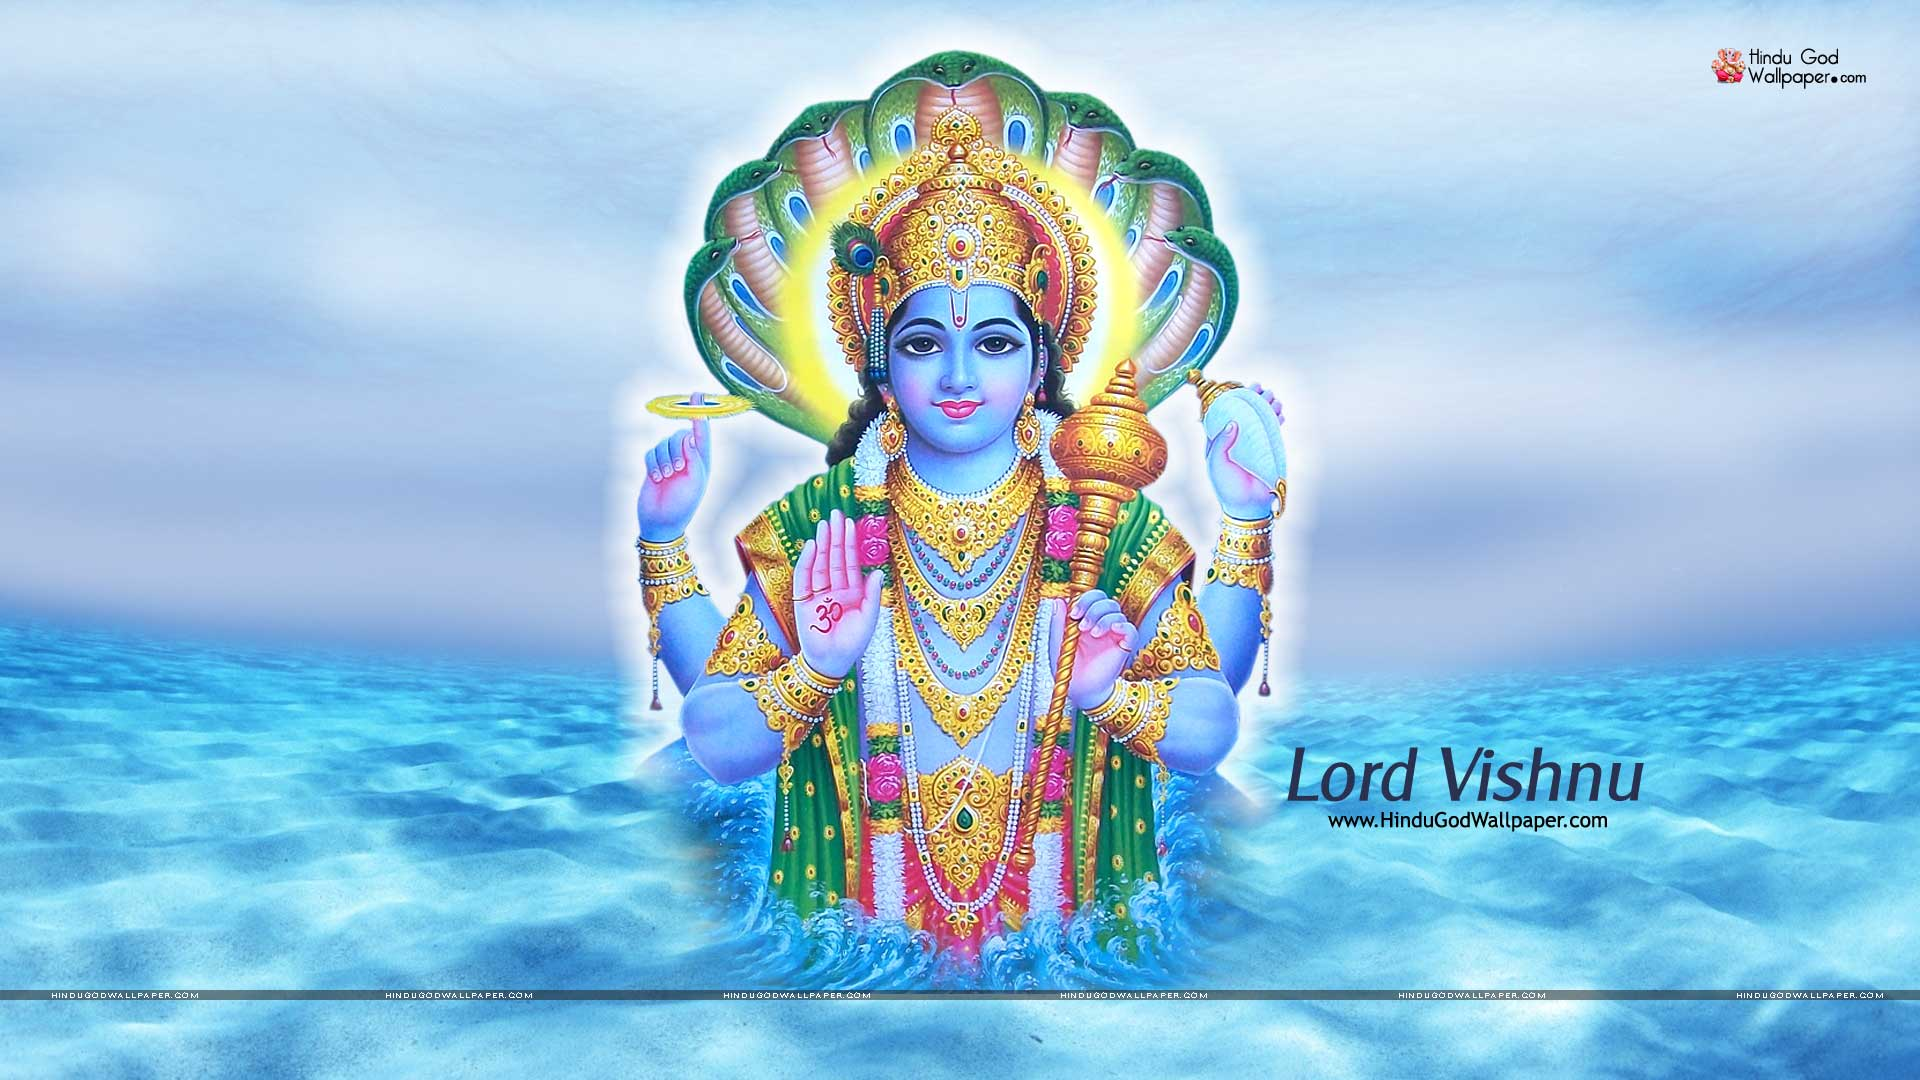 1920x1080 Lord Vishnu Hd Wallpapers Full Size High Resolution